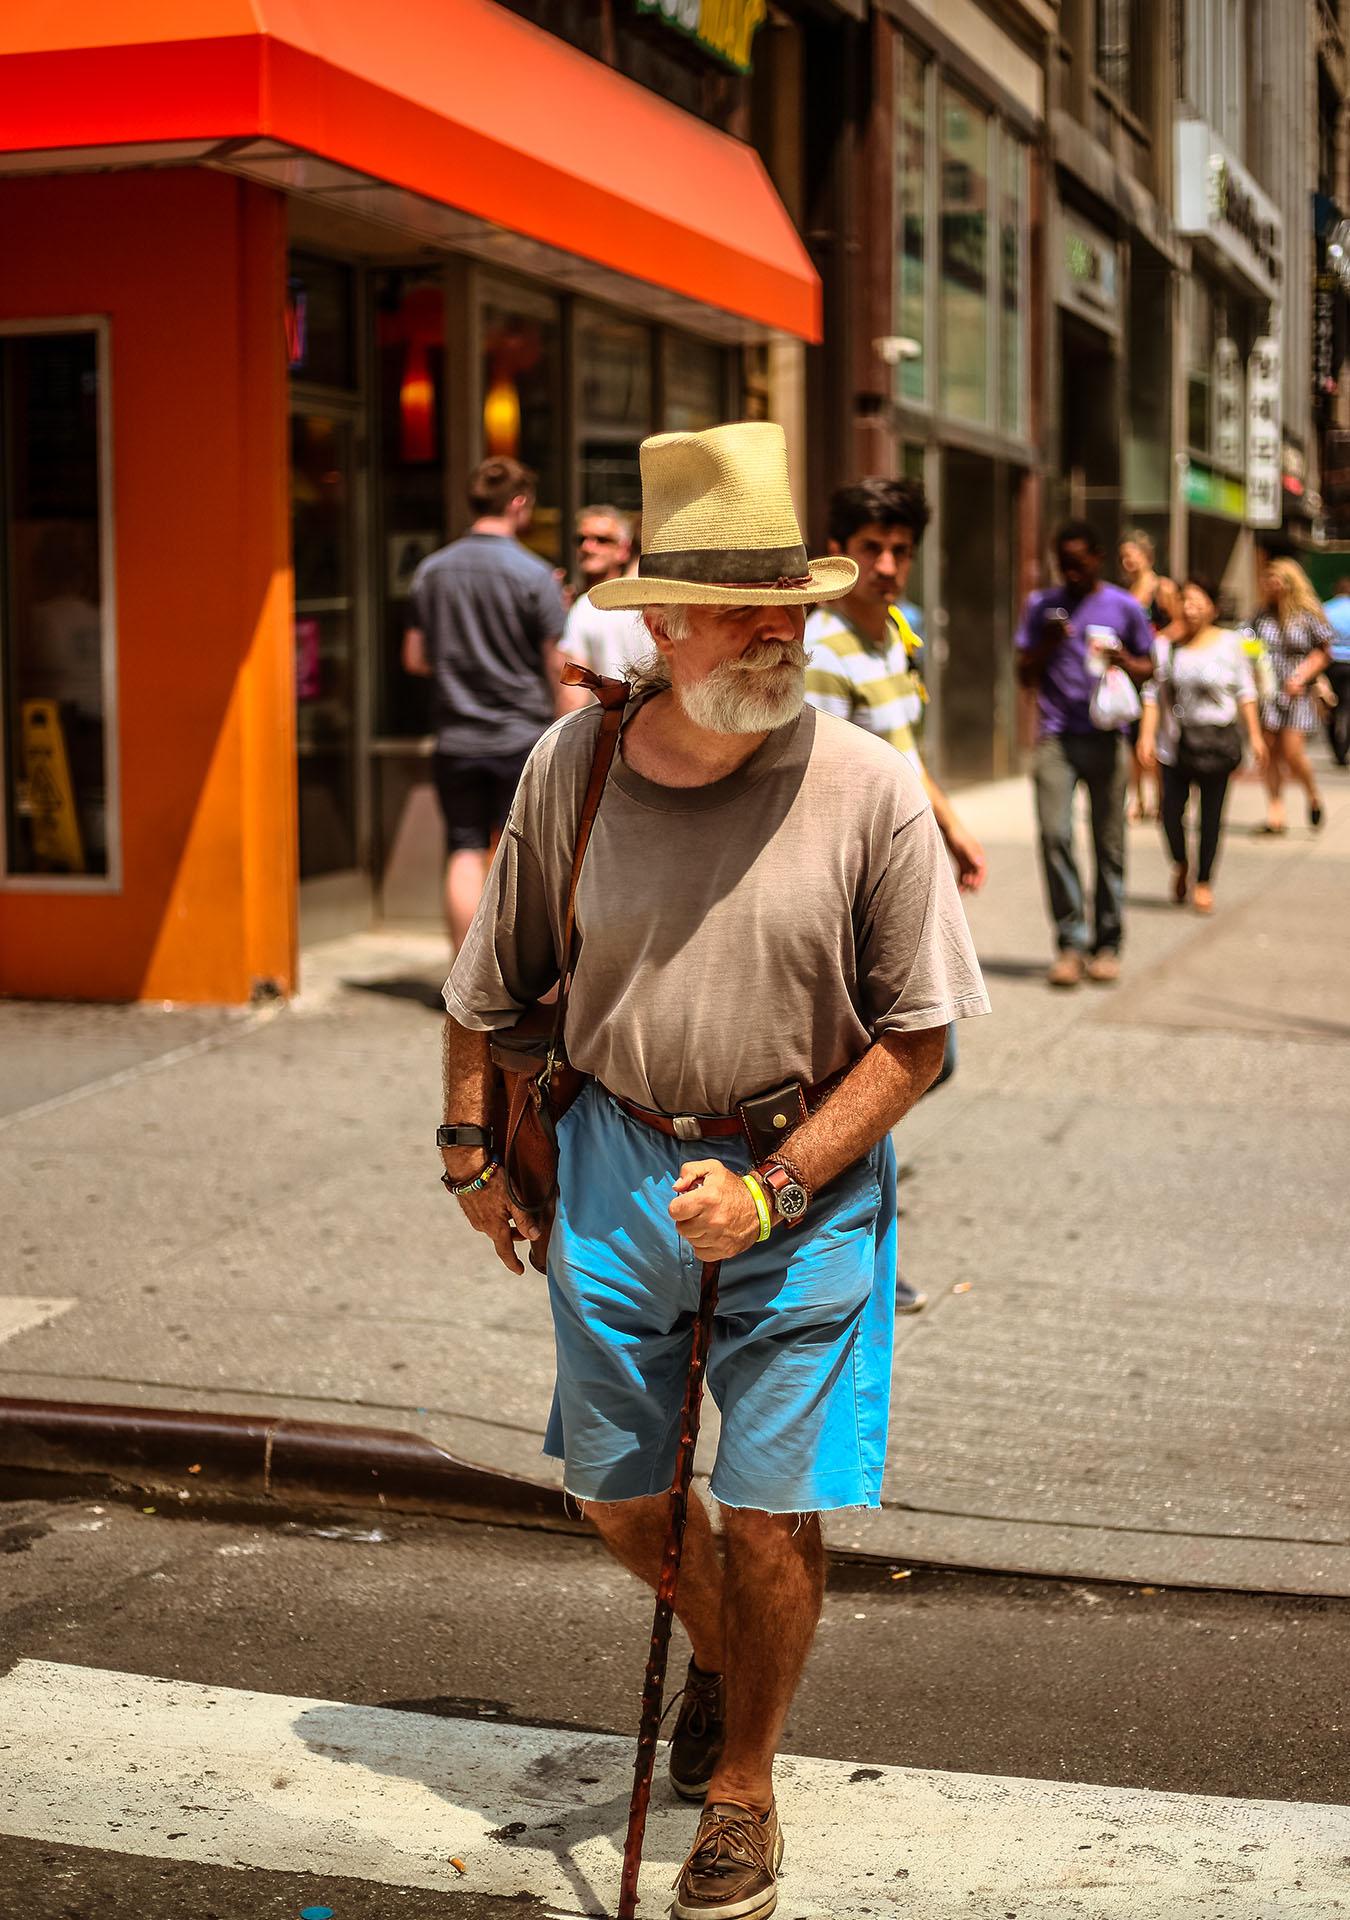 Vee-Streetportrait-Cynlagos-Newyork-Au20182.jpg